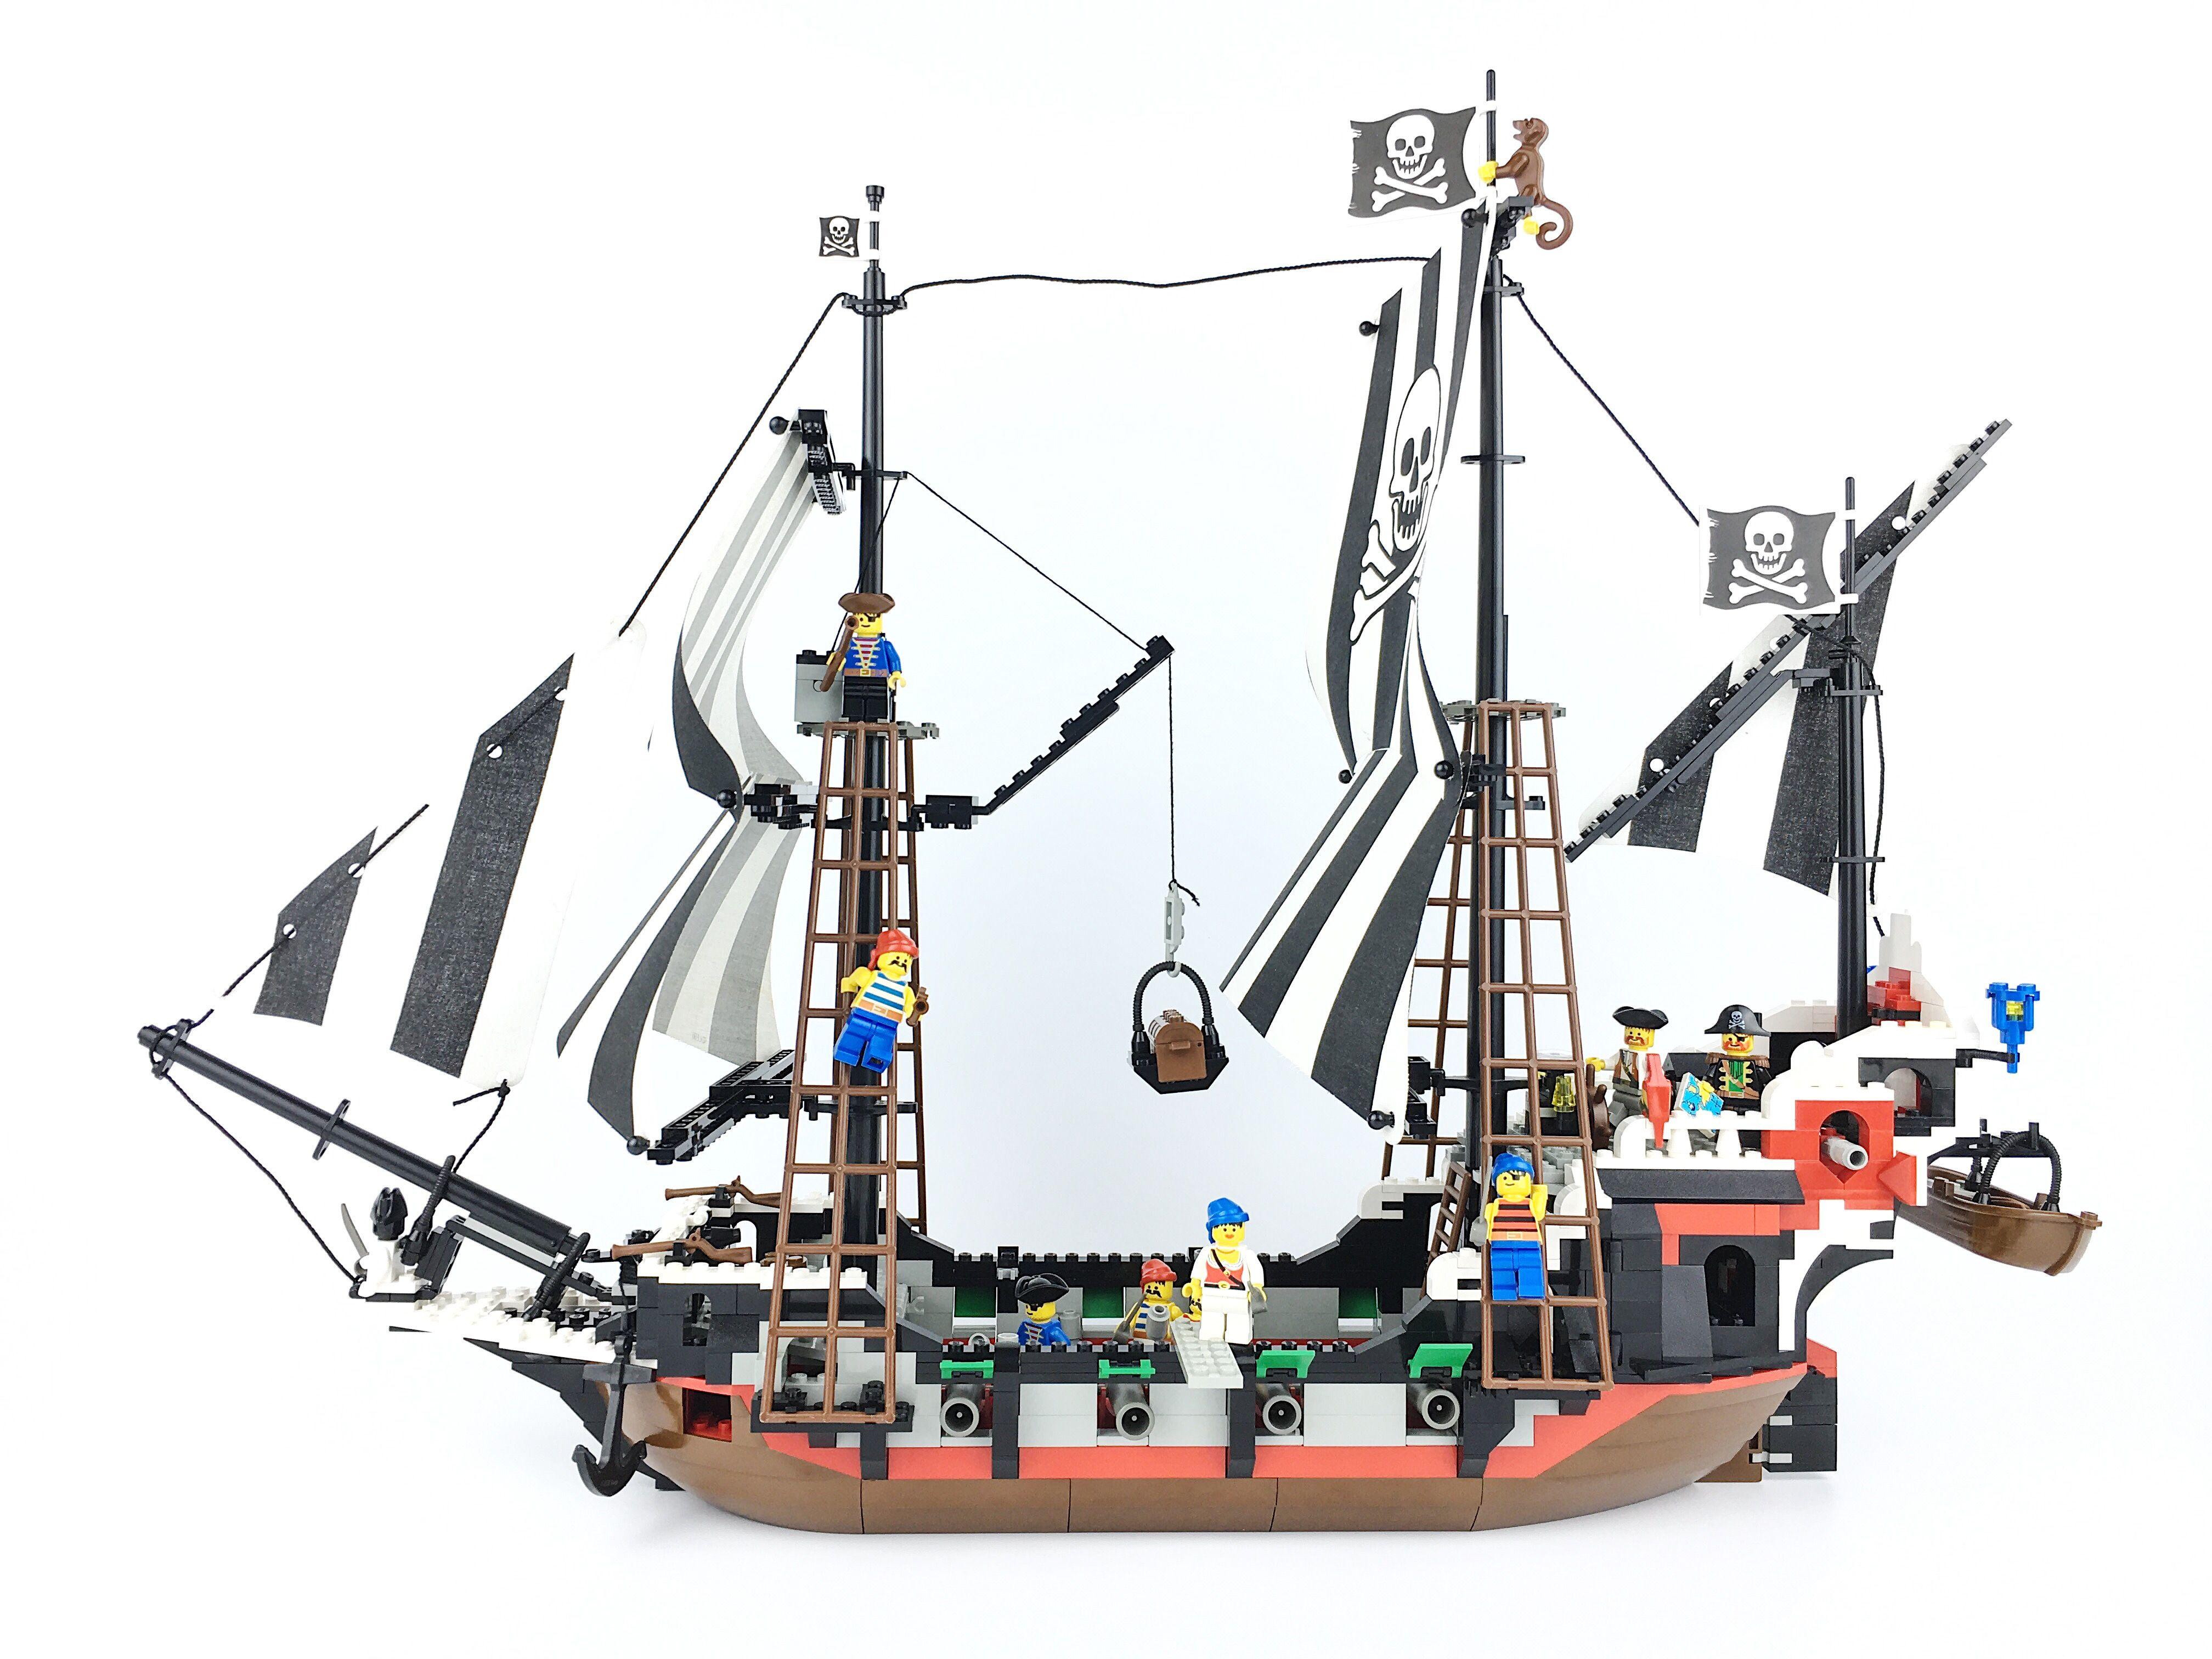 Laser Cut! Custom Replacement Cloth Sails Lego 6286 Skull/'s Eye Schooner